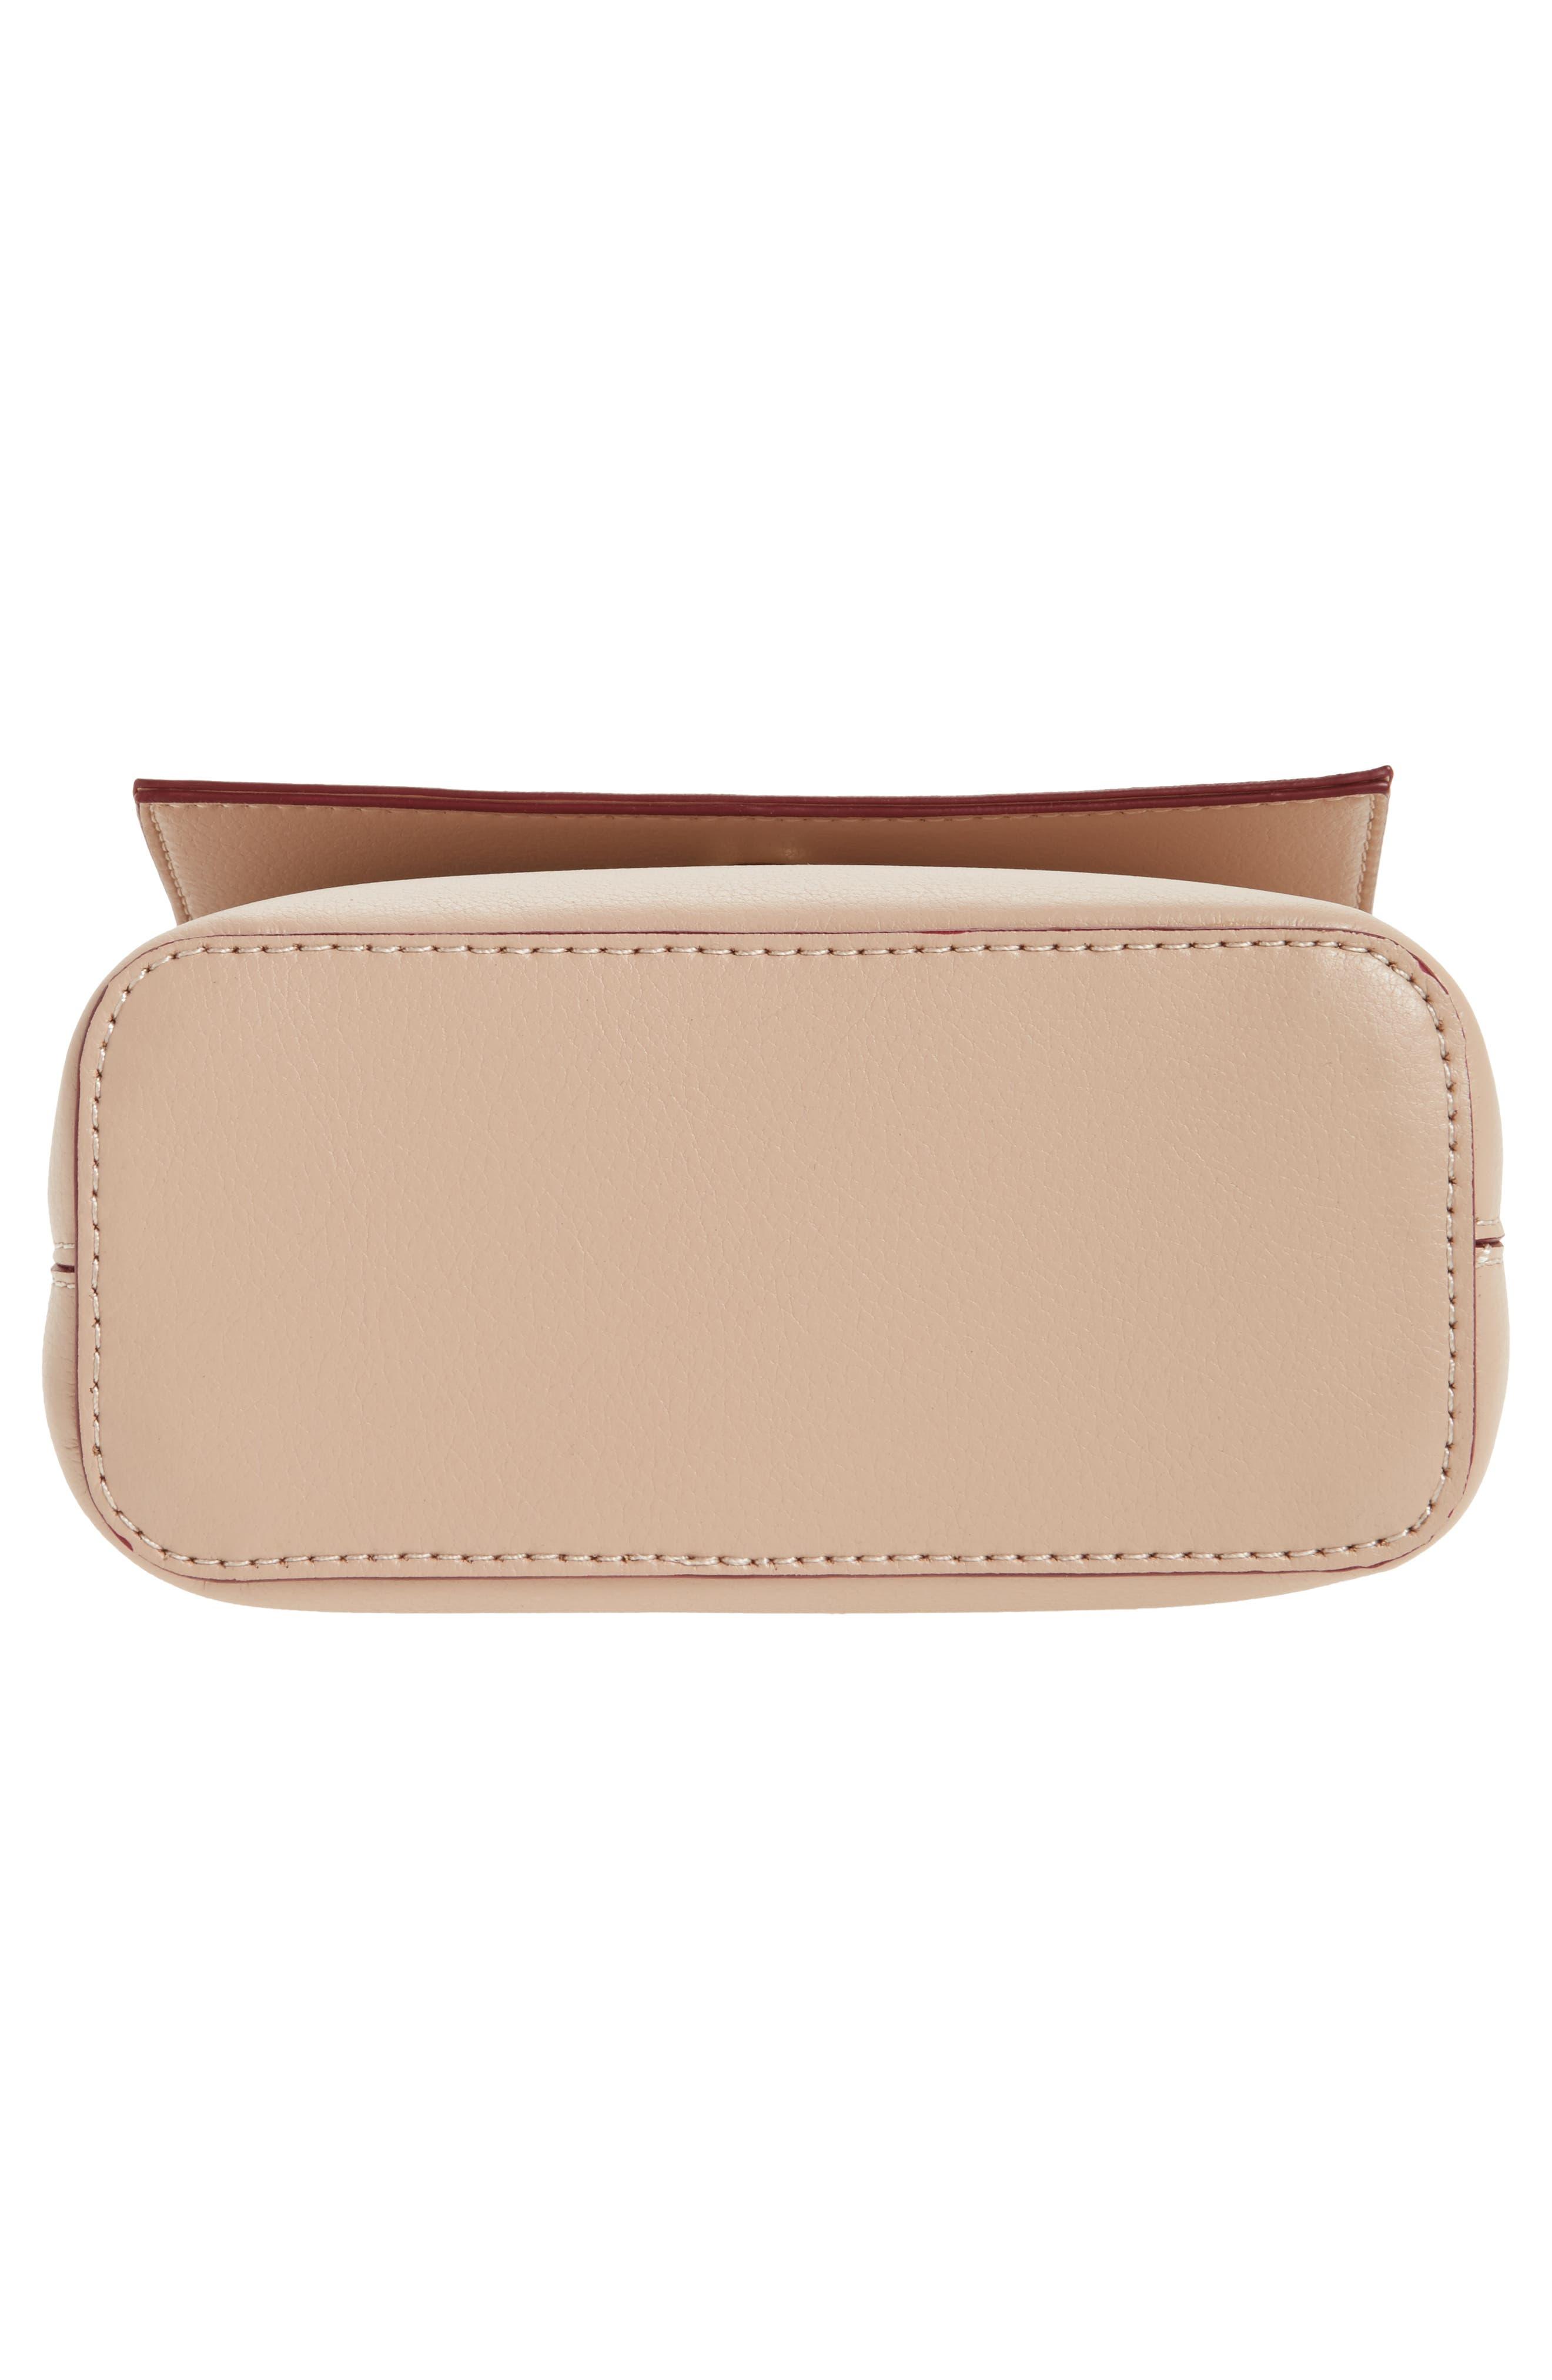 Mini Chino Crossbody Bag,                             Alternate thumbnail 18, color,